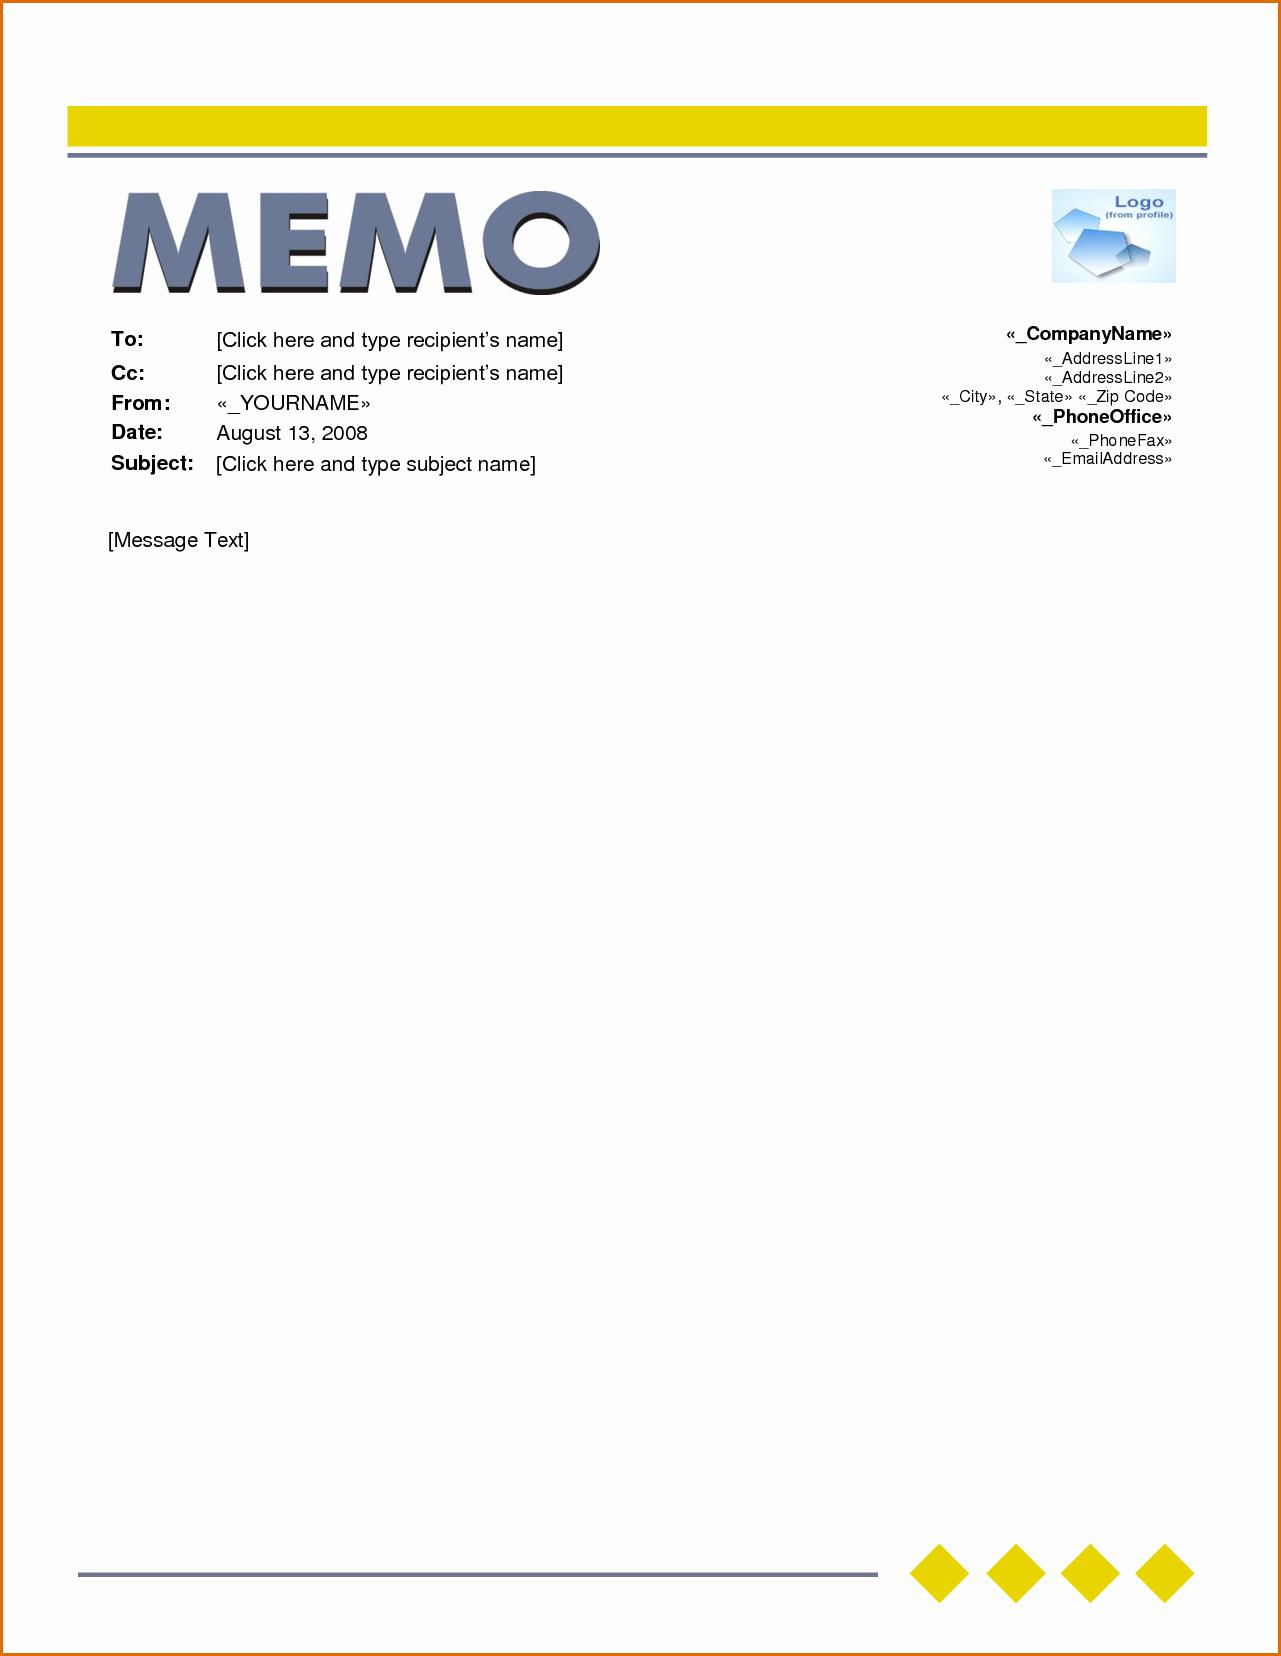 Ms Word Memo Templates Free Best Of 6 Microsoft Word Memo Template